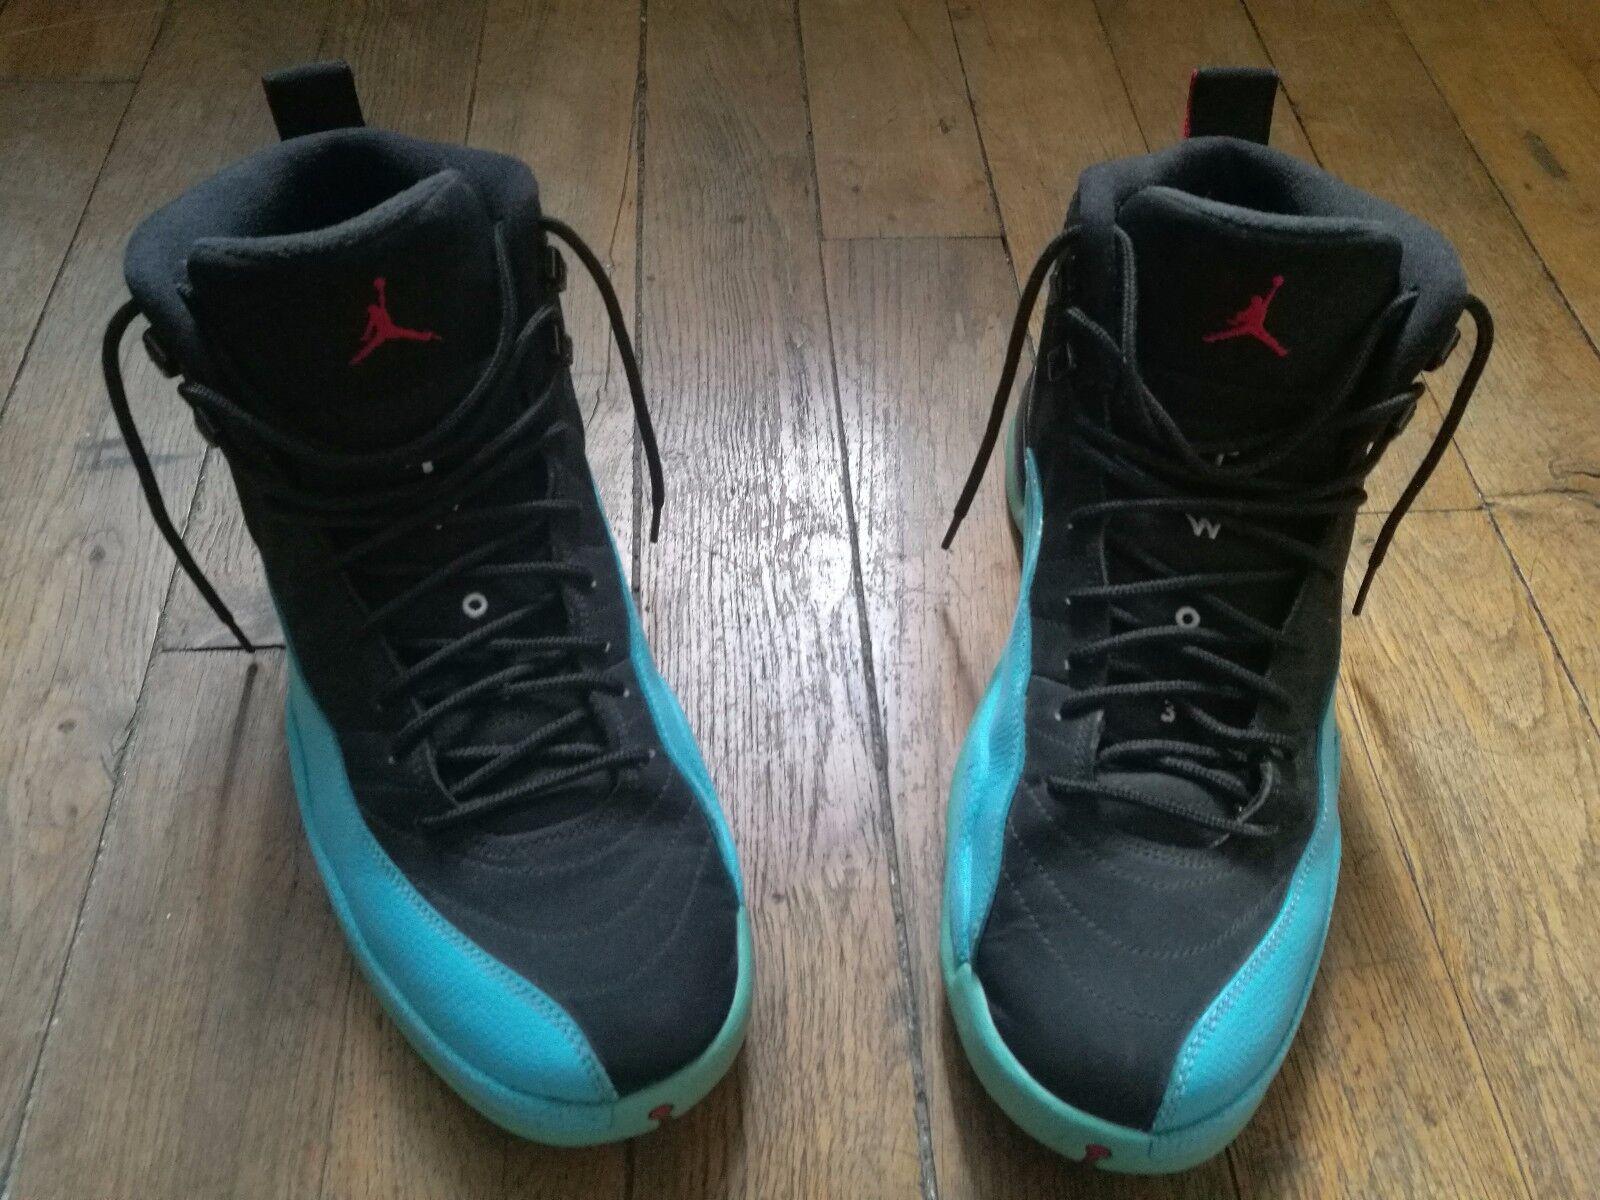 Nike XII Air Jordan 12 Retro XII Nike Gamma Bleu  Taille 44 EU / 1806fb